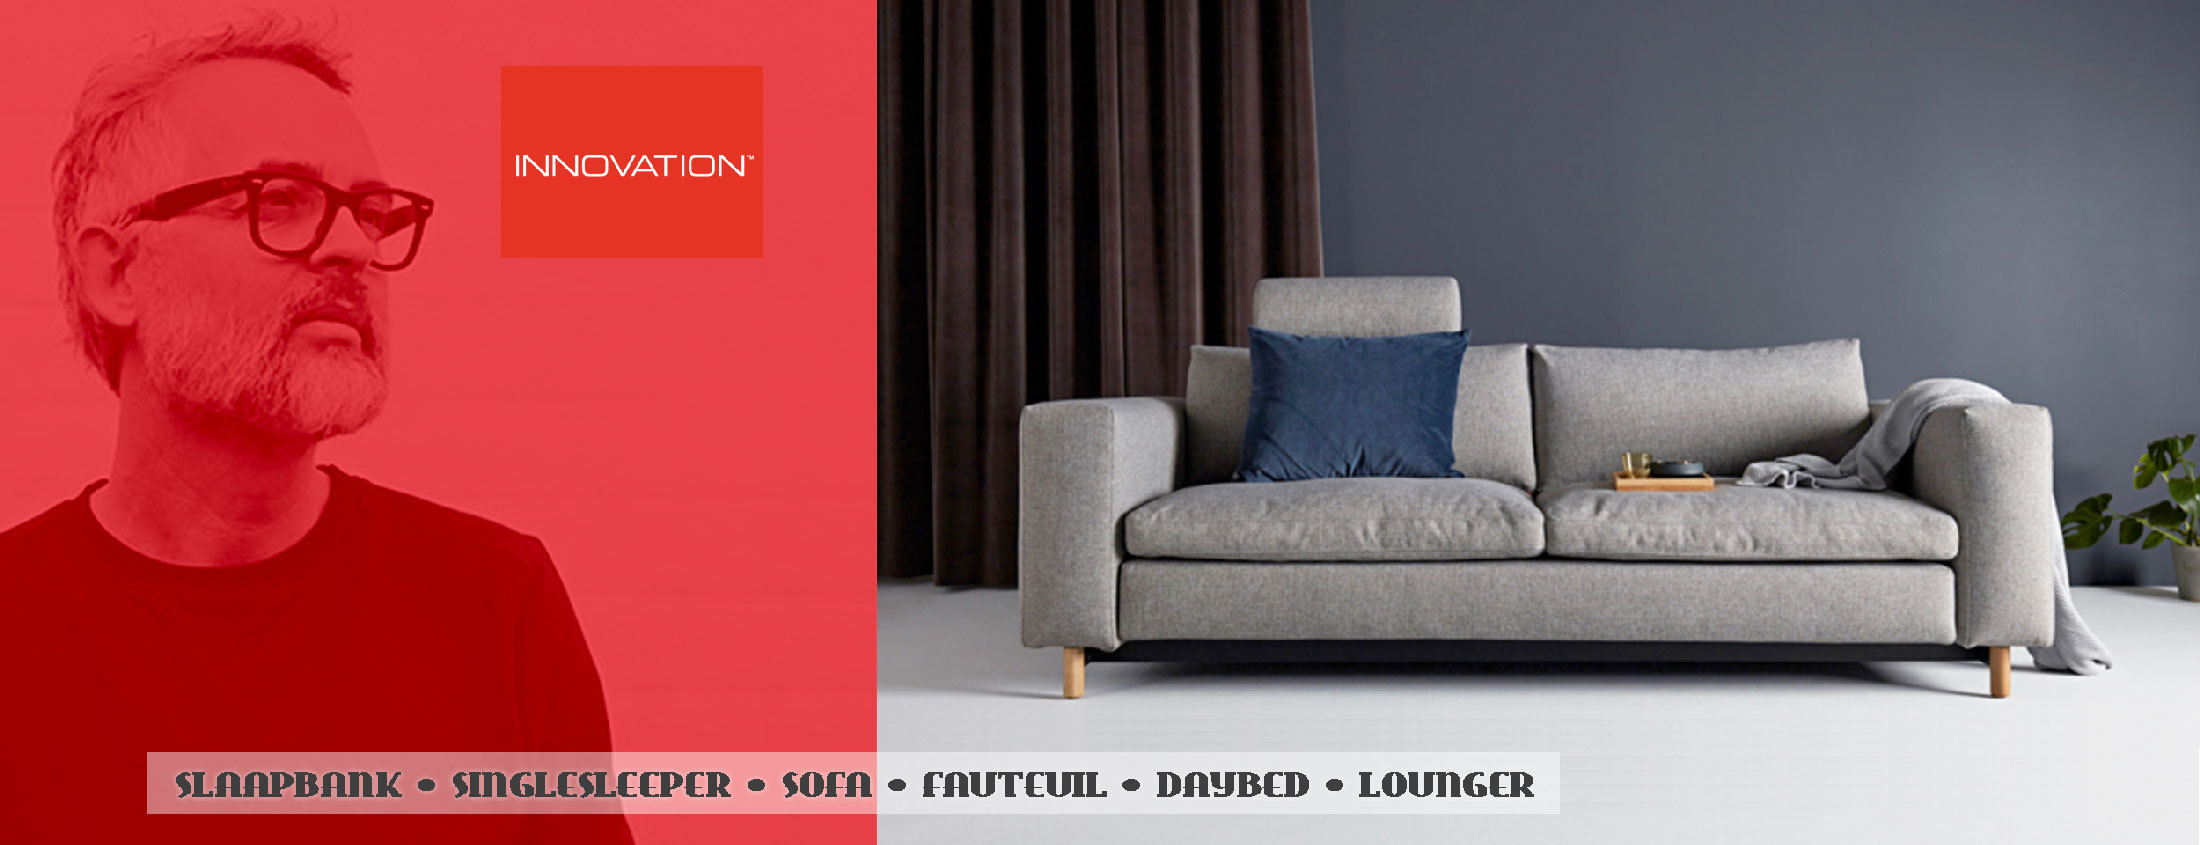 Slaapbank Design Outlet.Innovation Living Slaapbanken Zitbanken Daybeds Design Banken